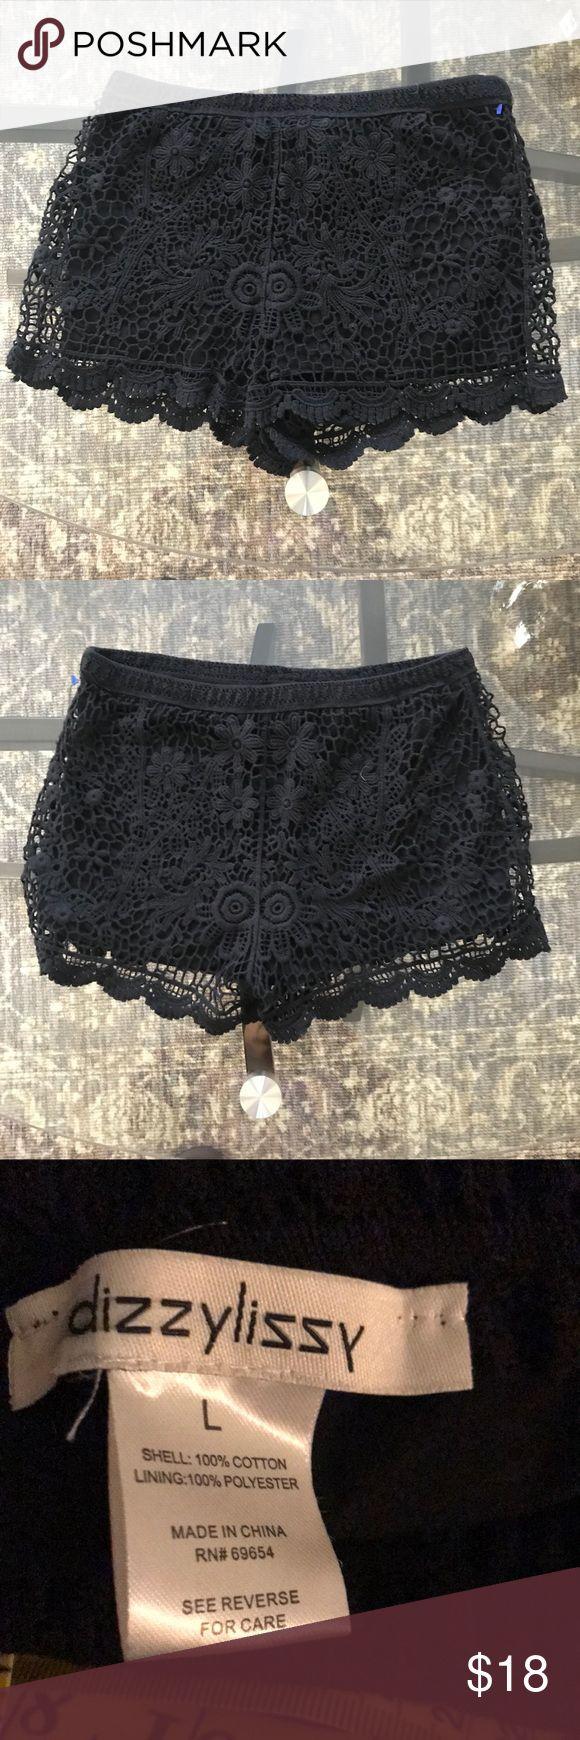 "Black crochet shorts Crochet fully lined shorts with elastic waistline inseam 3"" dizzylizzy Shorts"